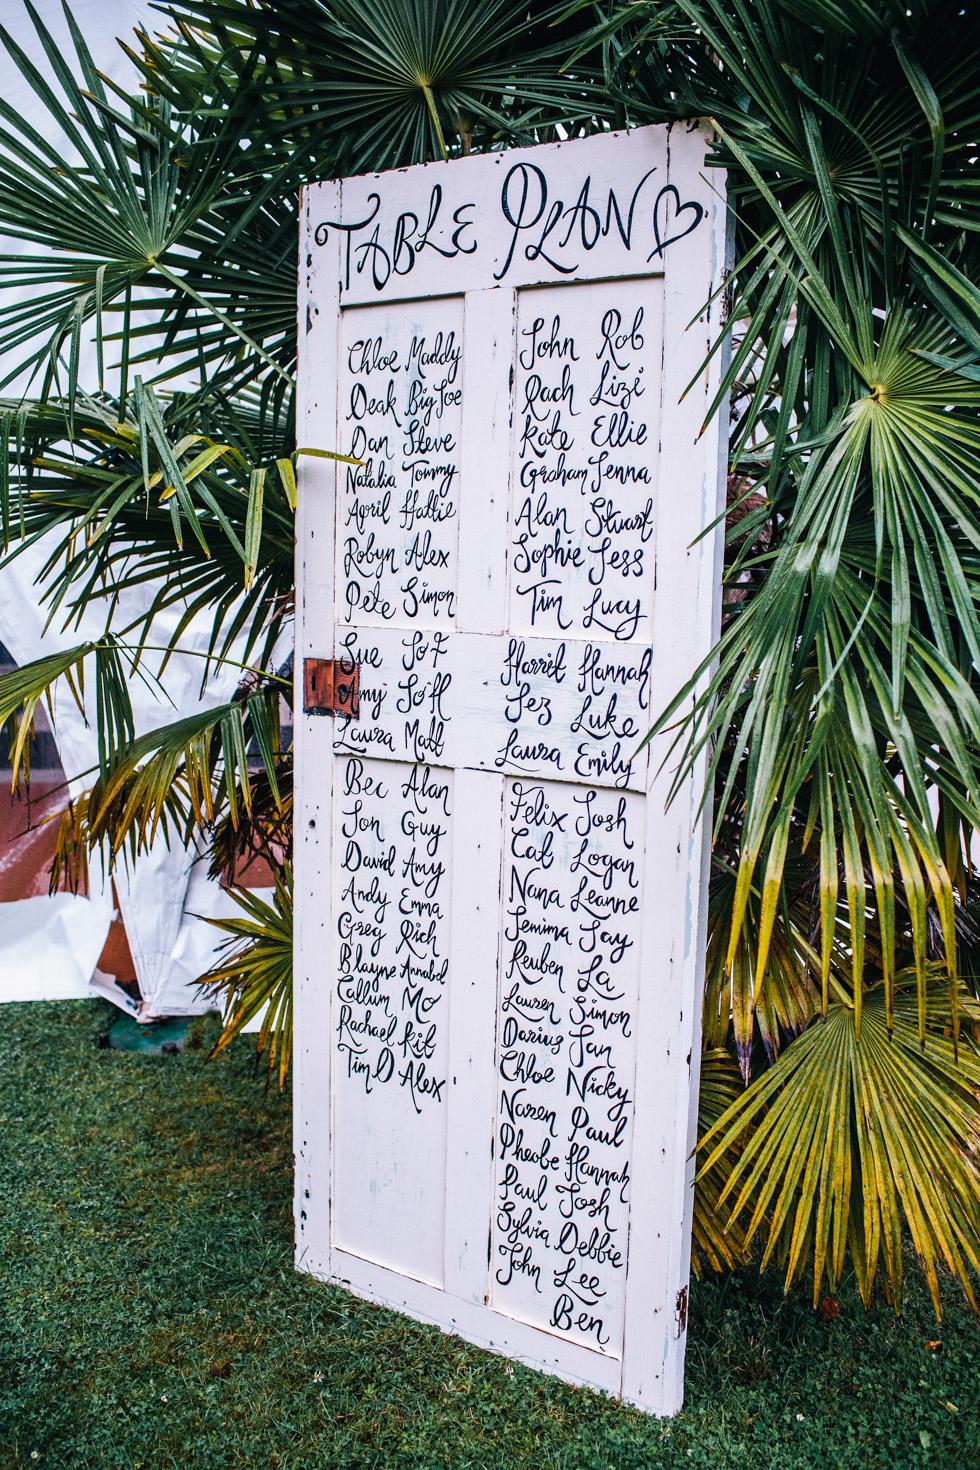 table plan hand written in calligraphy on old wooden door